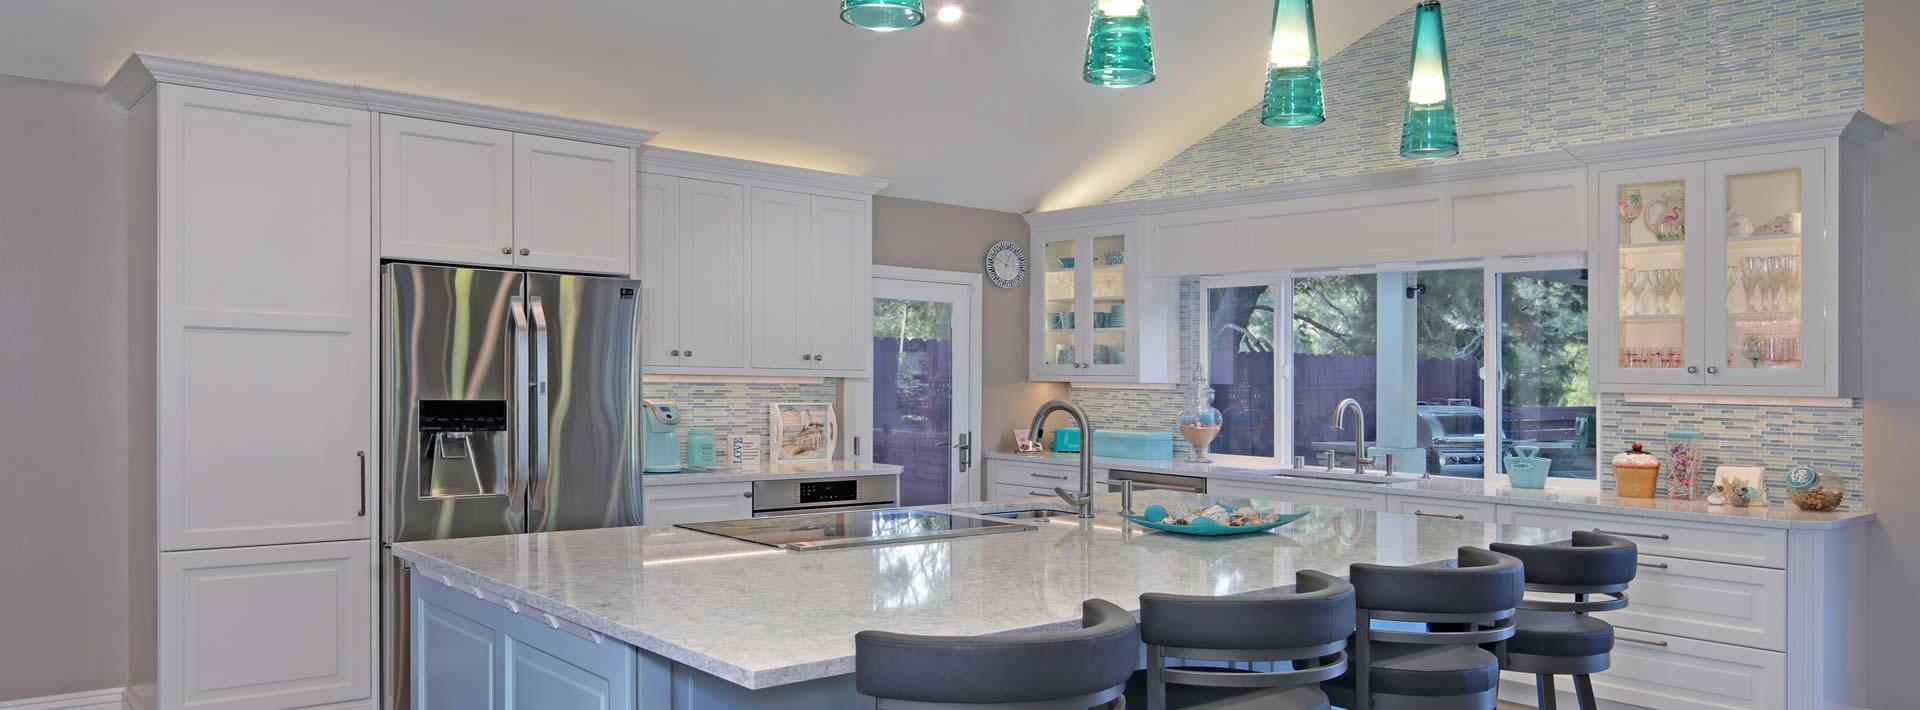 Eclectic Kitchen in Laguna Hills | Le Gourmet Kitchen Ltd.